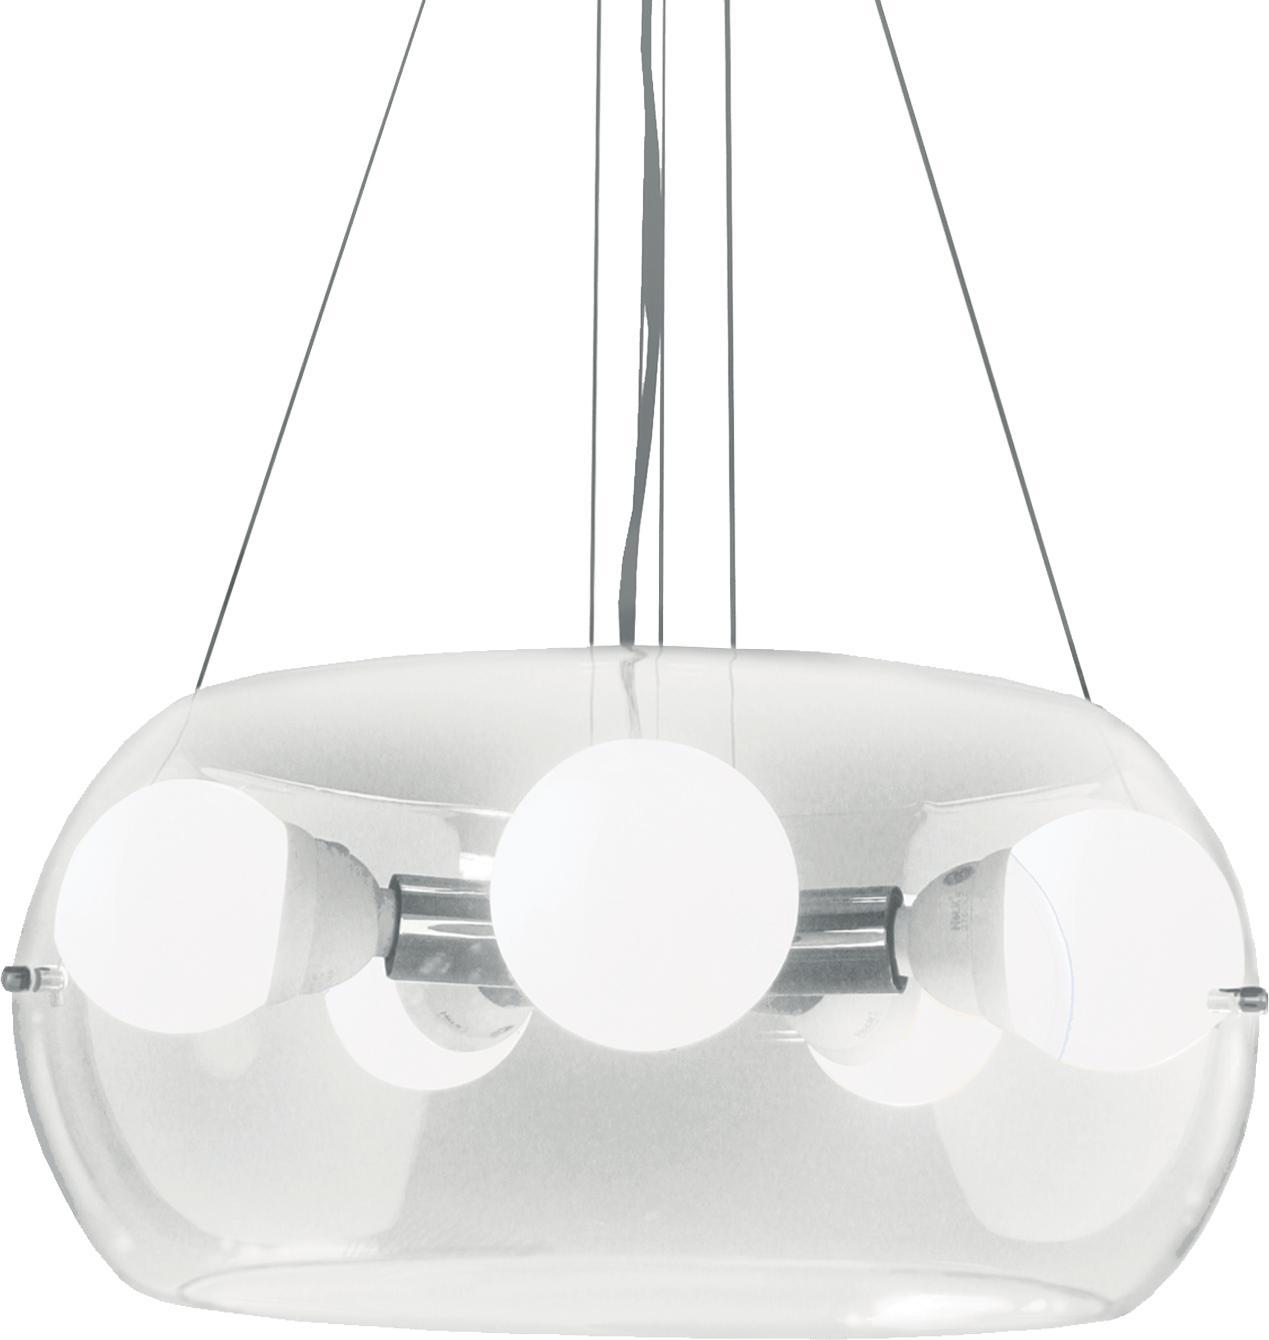 Ideal lux LED Audi 10 haengende Lampe 5x5W 16863